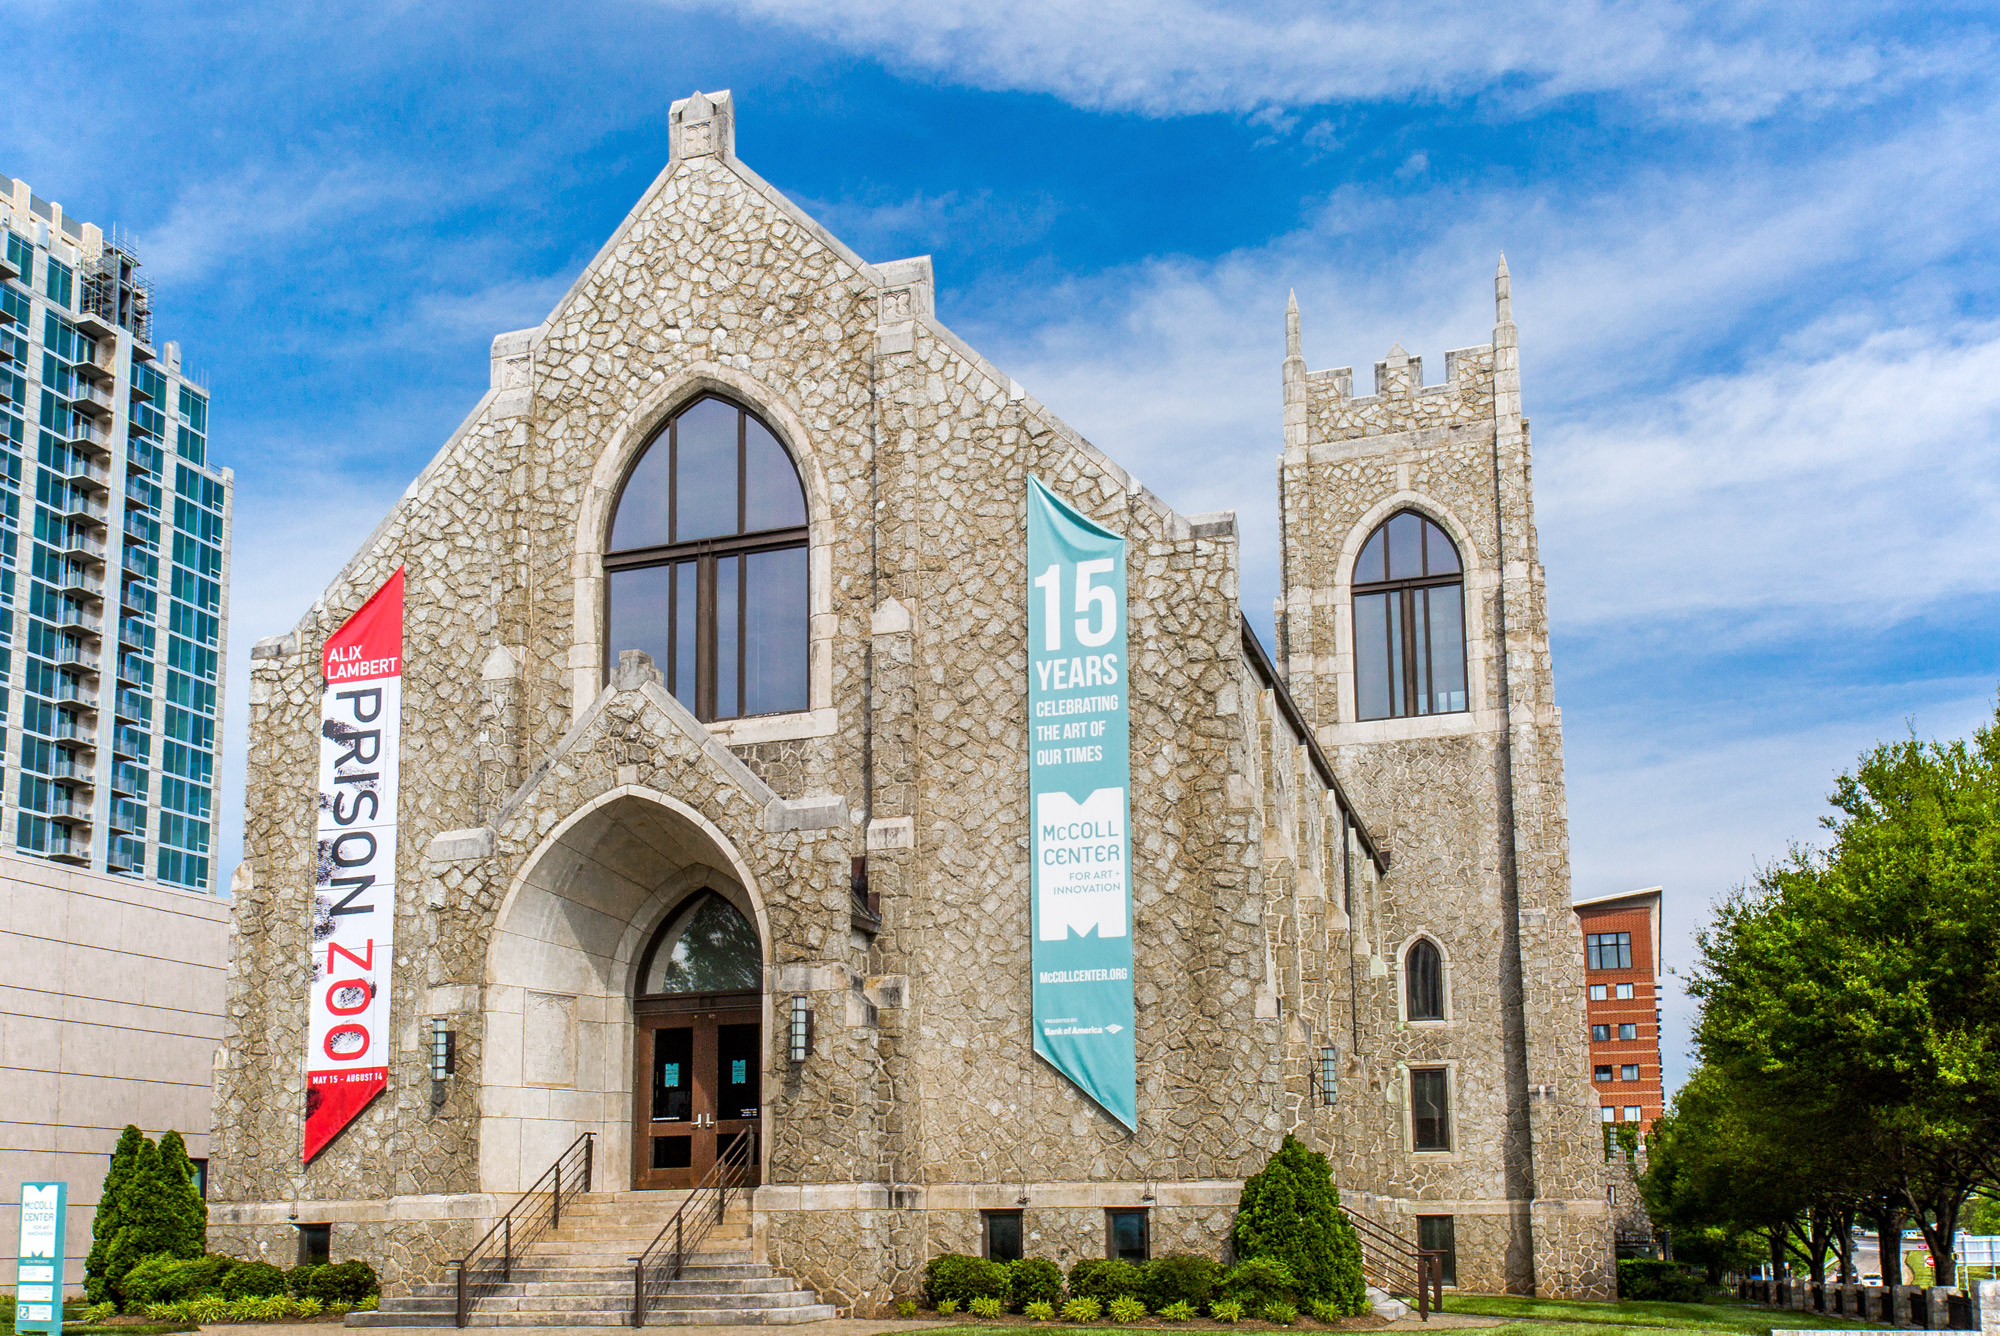 McColl Center<a href=mccoll-center-for-art-innovation>→</a><strong>Center for Art + Innovation</strong>